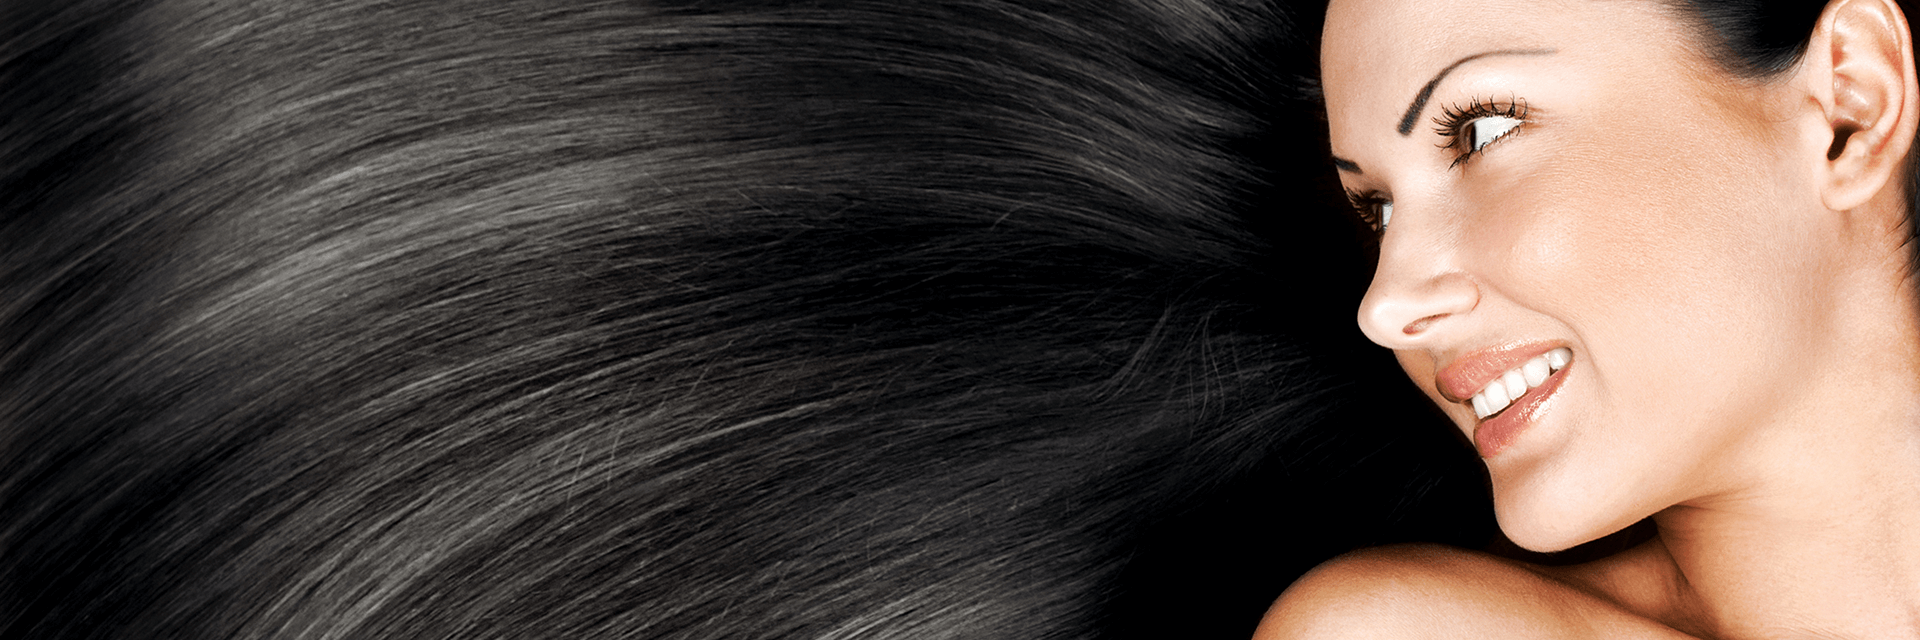 Hari Care Products Sri Lanka, Amla cool hair oil sri lanka, Amla Gold hair oil, Herbal Hair oil with conditioner, Navarathna oil Sri Lanka, Neelyadi plus hair oil sri lanka, Ravan Aththora Ayurvedic Hair Dye, Ravan Black Henna Sri Lanka, Ravan Kohomba Ayurvedic Hair Dye Sri Lanka provided by Herbal Cosmetic Items and Product manufaturer in Sri Lanka Dream Life Science Pvt Ltd.